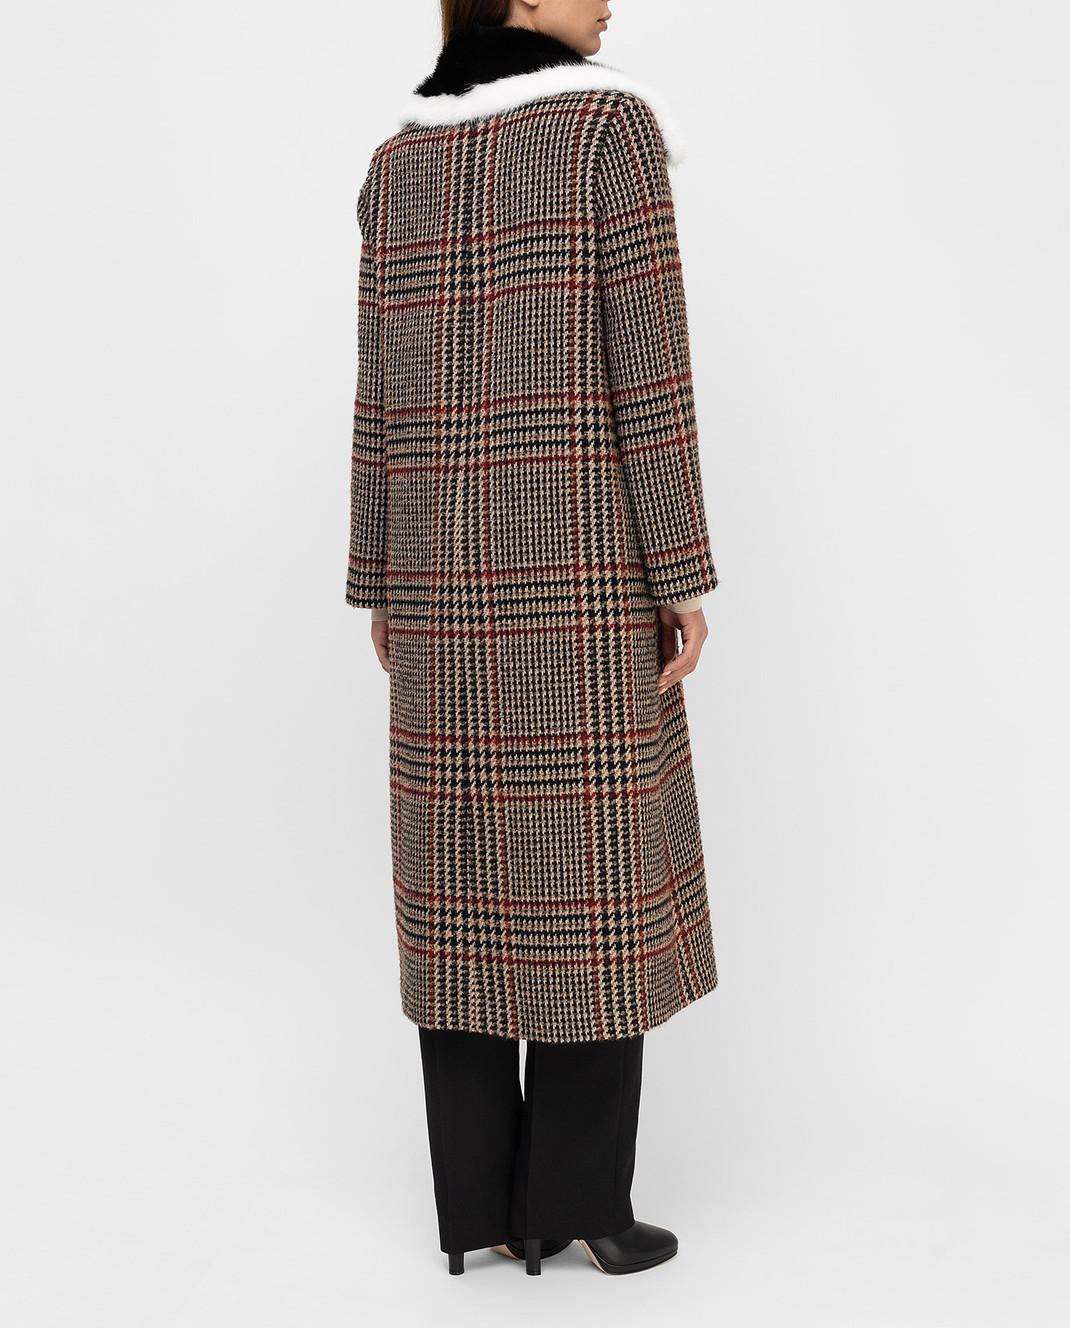 Simonetta Ravizza Бежевое пальто с мехом норки AZZURRA3 изображение 4